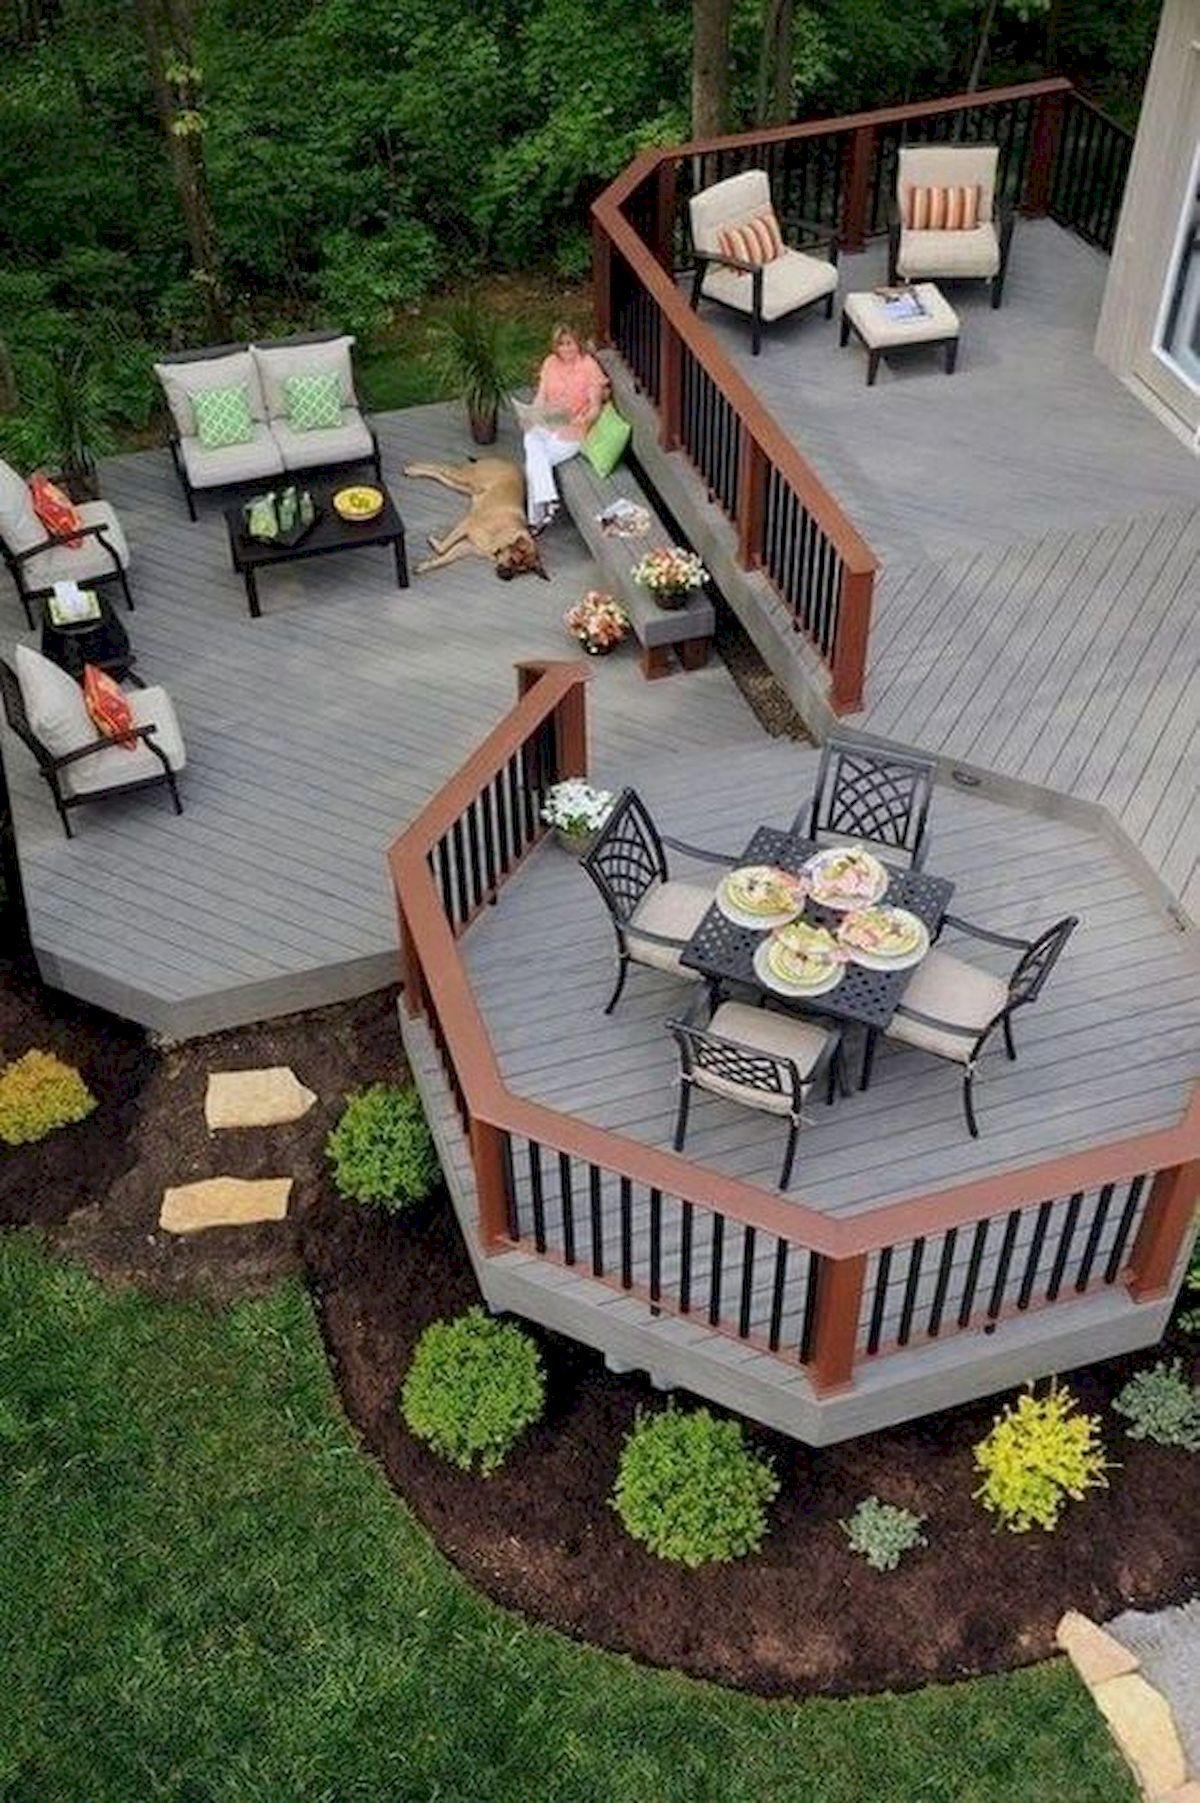 50 Fantastic Backyard Patio and Decking Design Ideas (46)